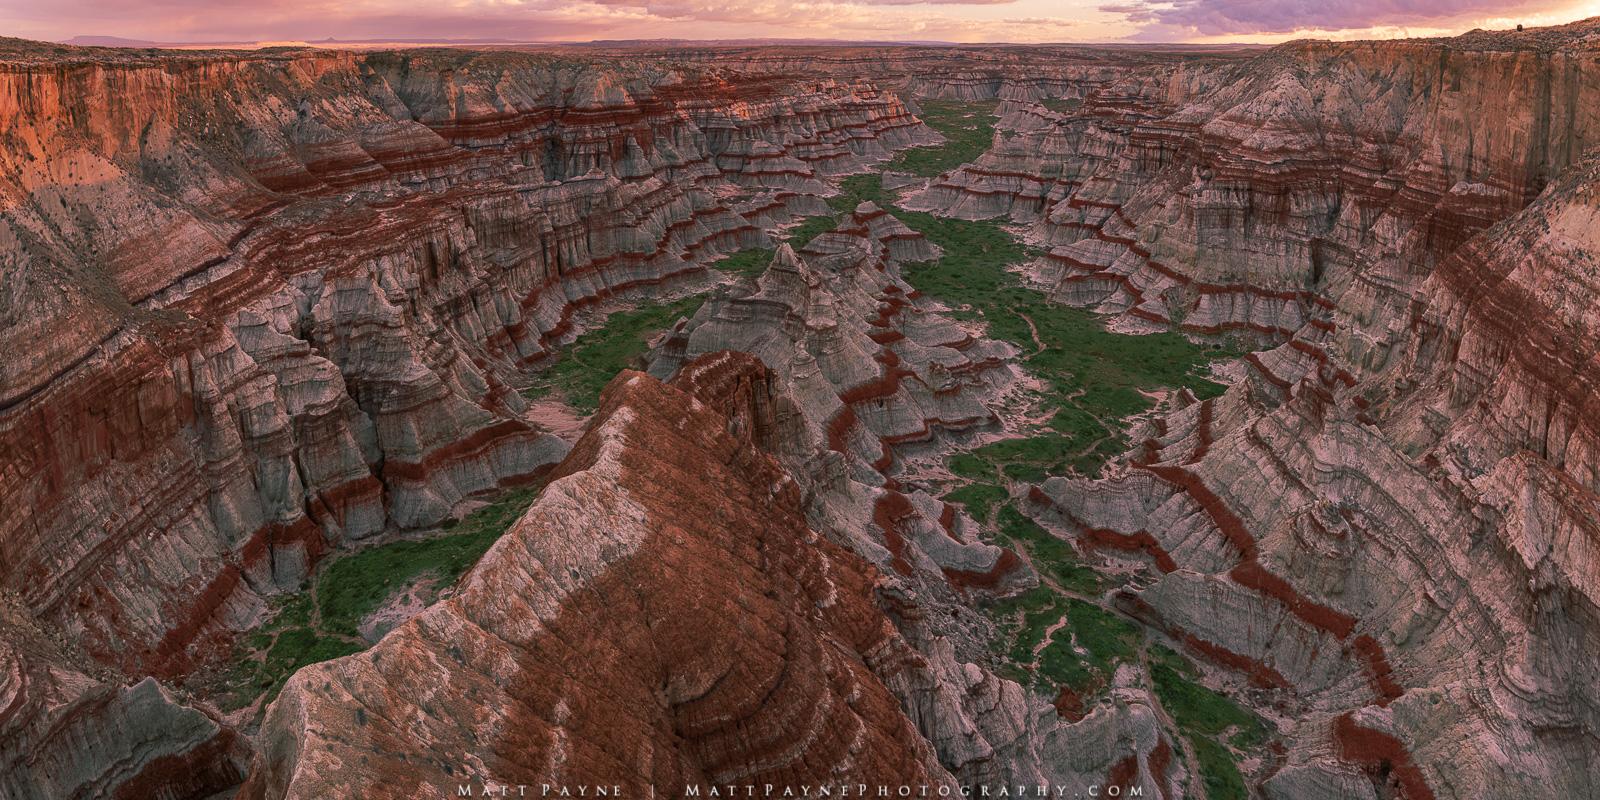 Erosion, Panorama, Ribbons, amphitheatre, canyon, desert, geologic, layers, photo